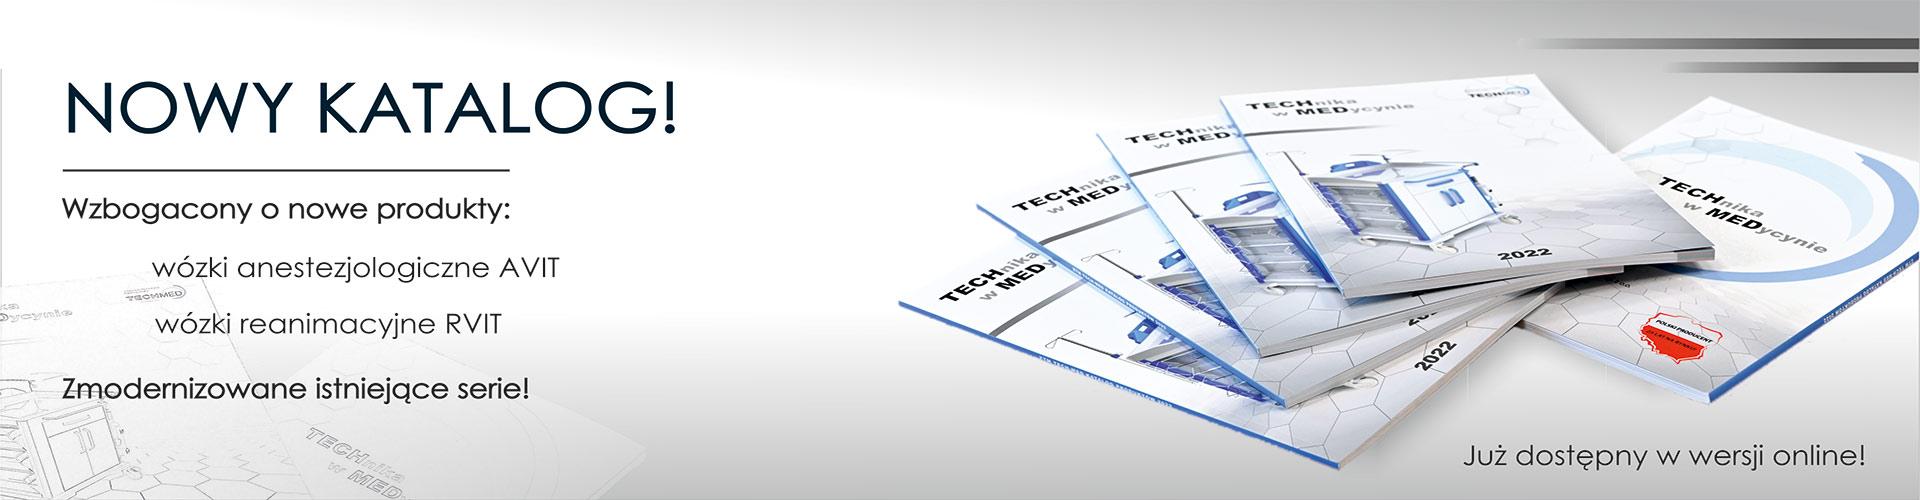 Nowy katalog Tech-Med